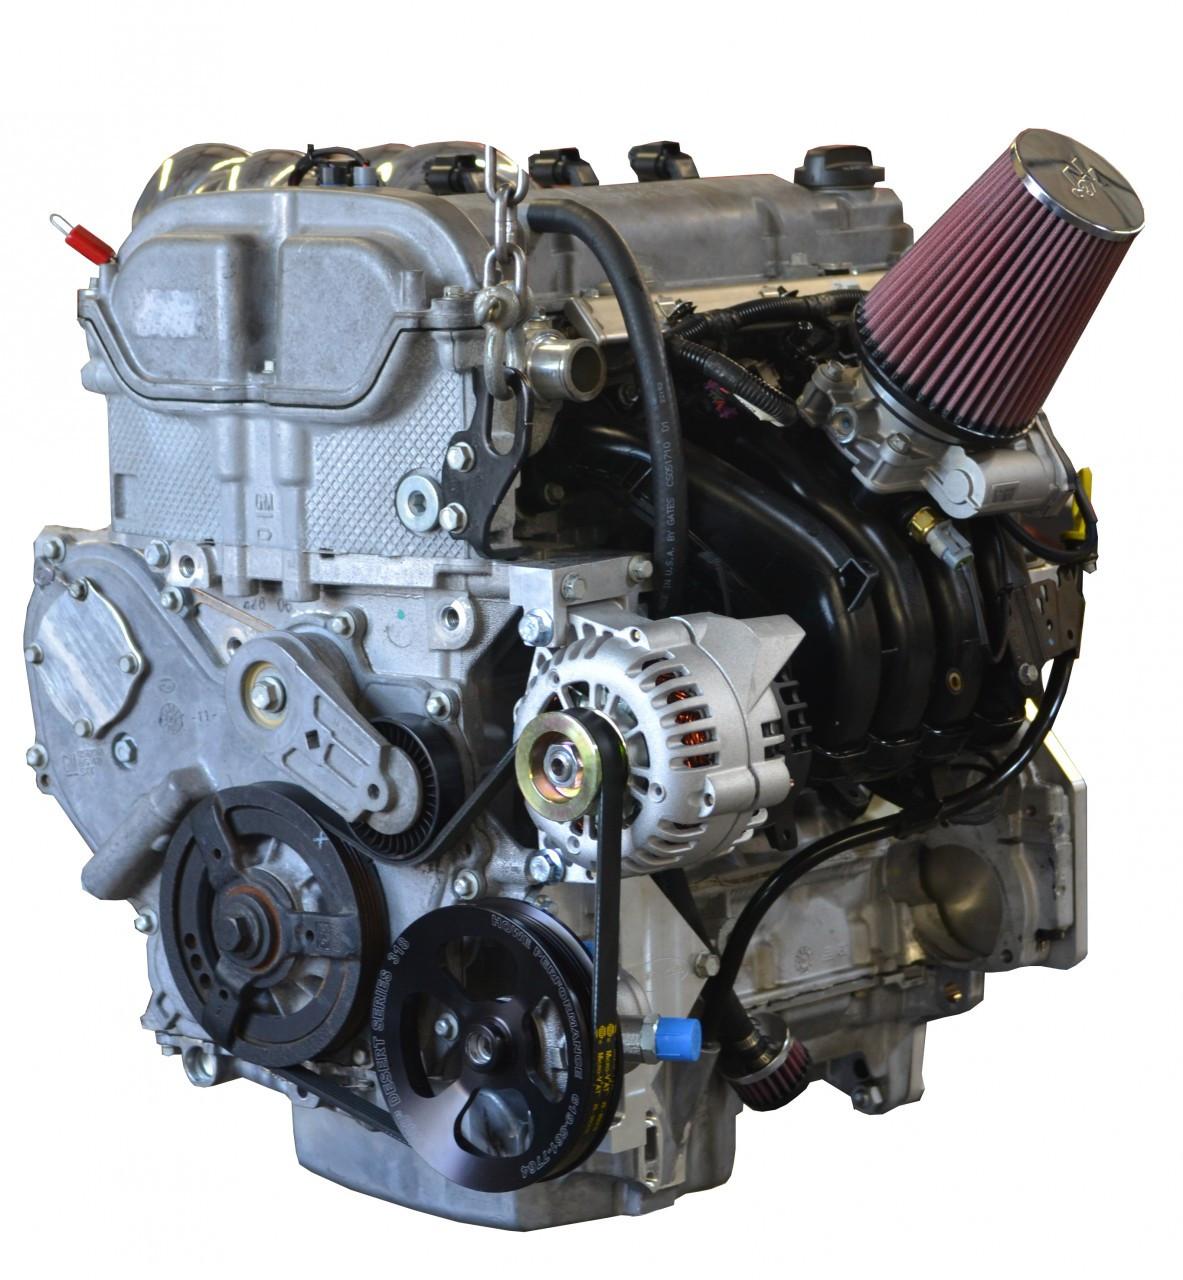 Ecotec 2 4l 190 Hp Turn Key Engine Assembly - Off Road